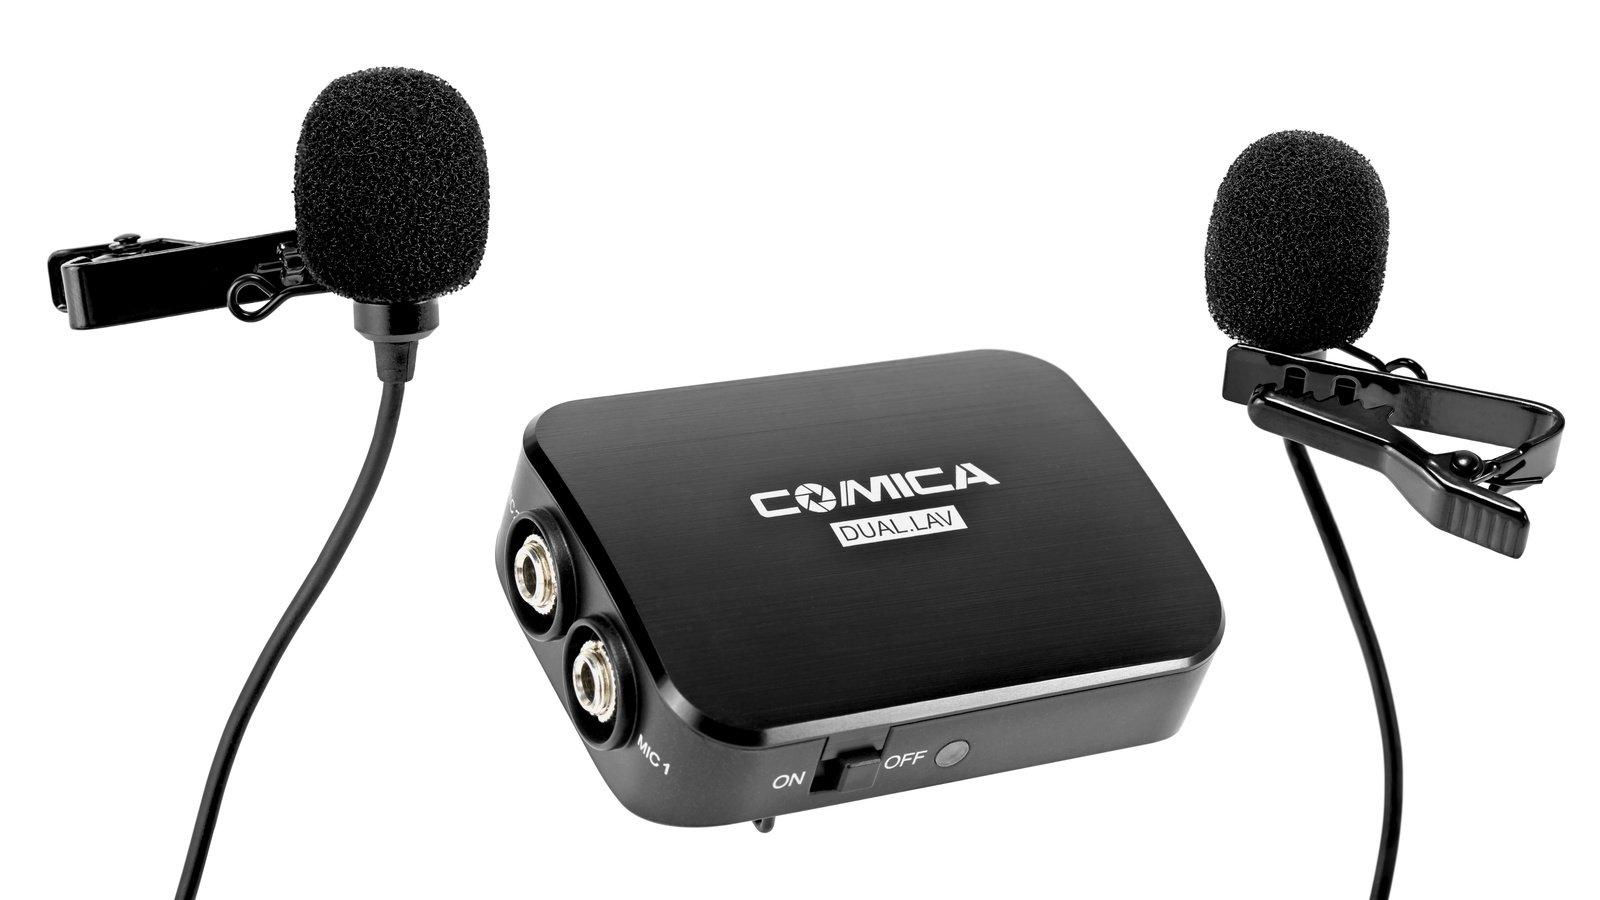 Commlite Comica CVM-D03 Dual Stereo Lavalier Mikrofone (4.5m Kabellänge).